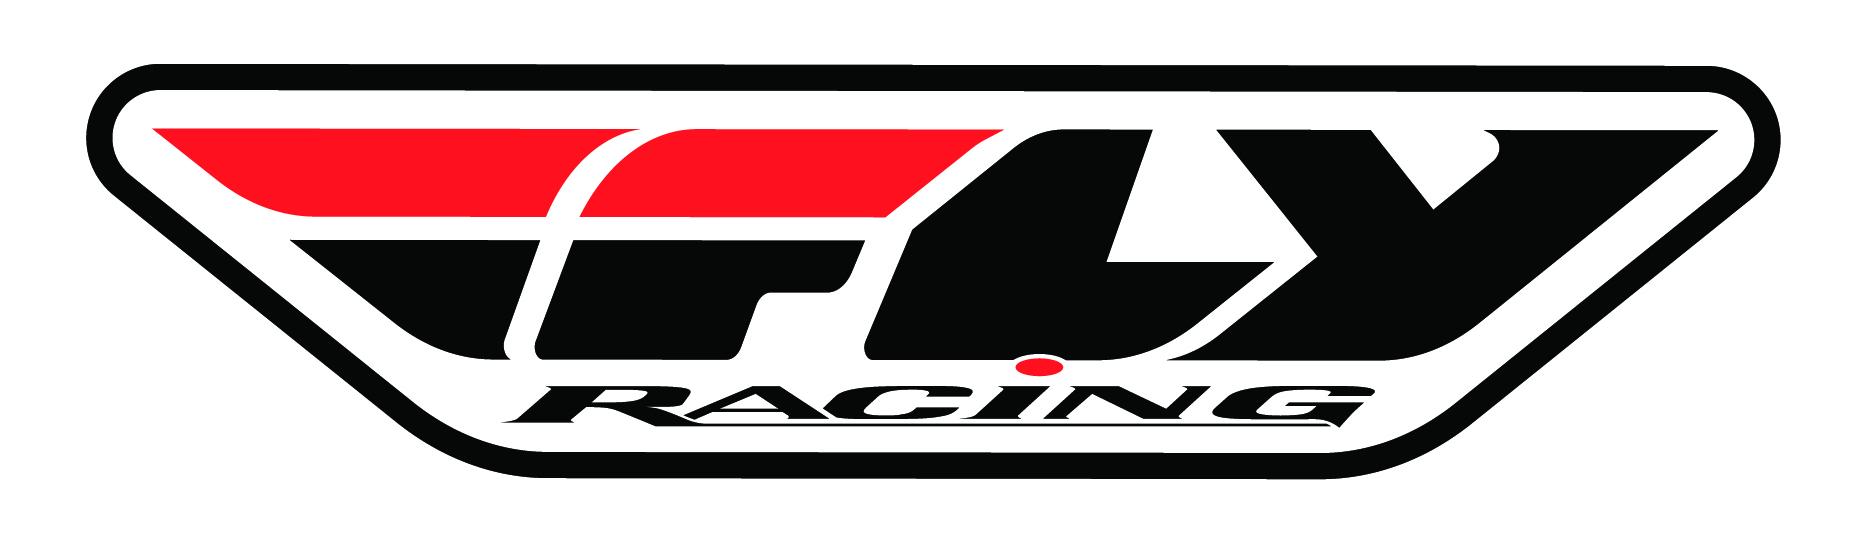 FLY logo 06 redblack300dpi.jpg